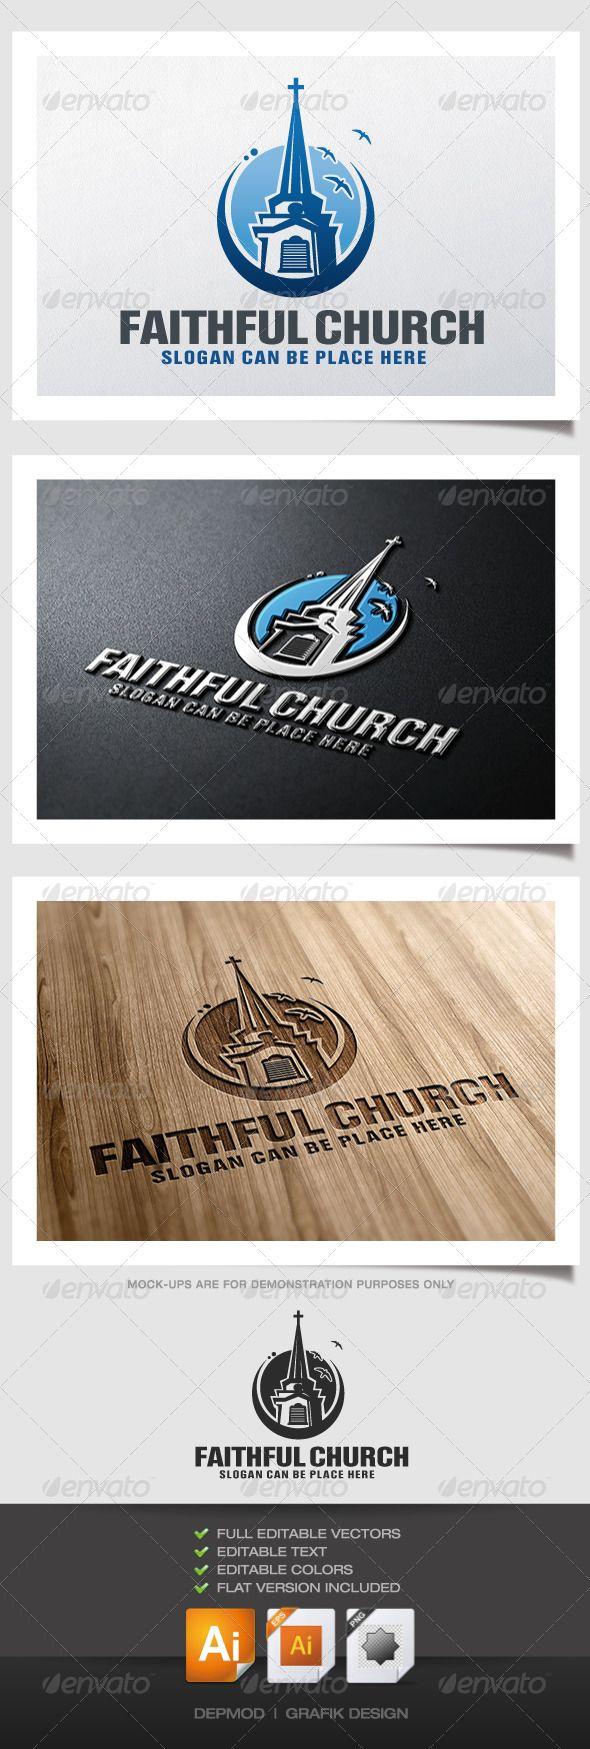 Faithful Church  Logo Design Template Vector #logotype Download it here:  http://graphicriver.net/item/faithful-church-logo/4587225?s_rank=504?ref=nesto